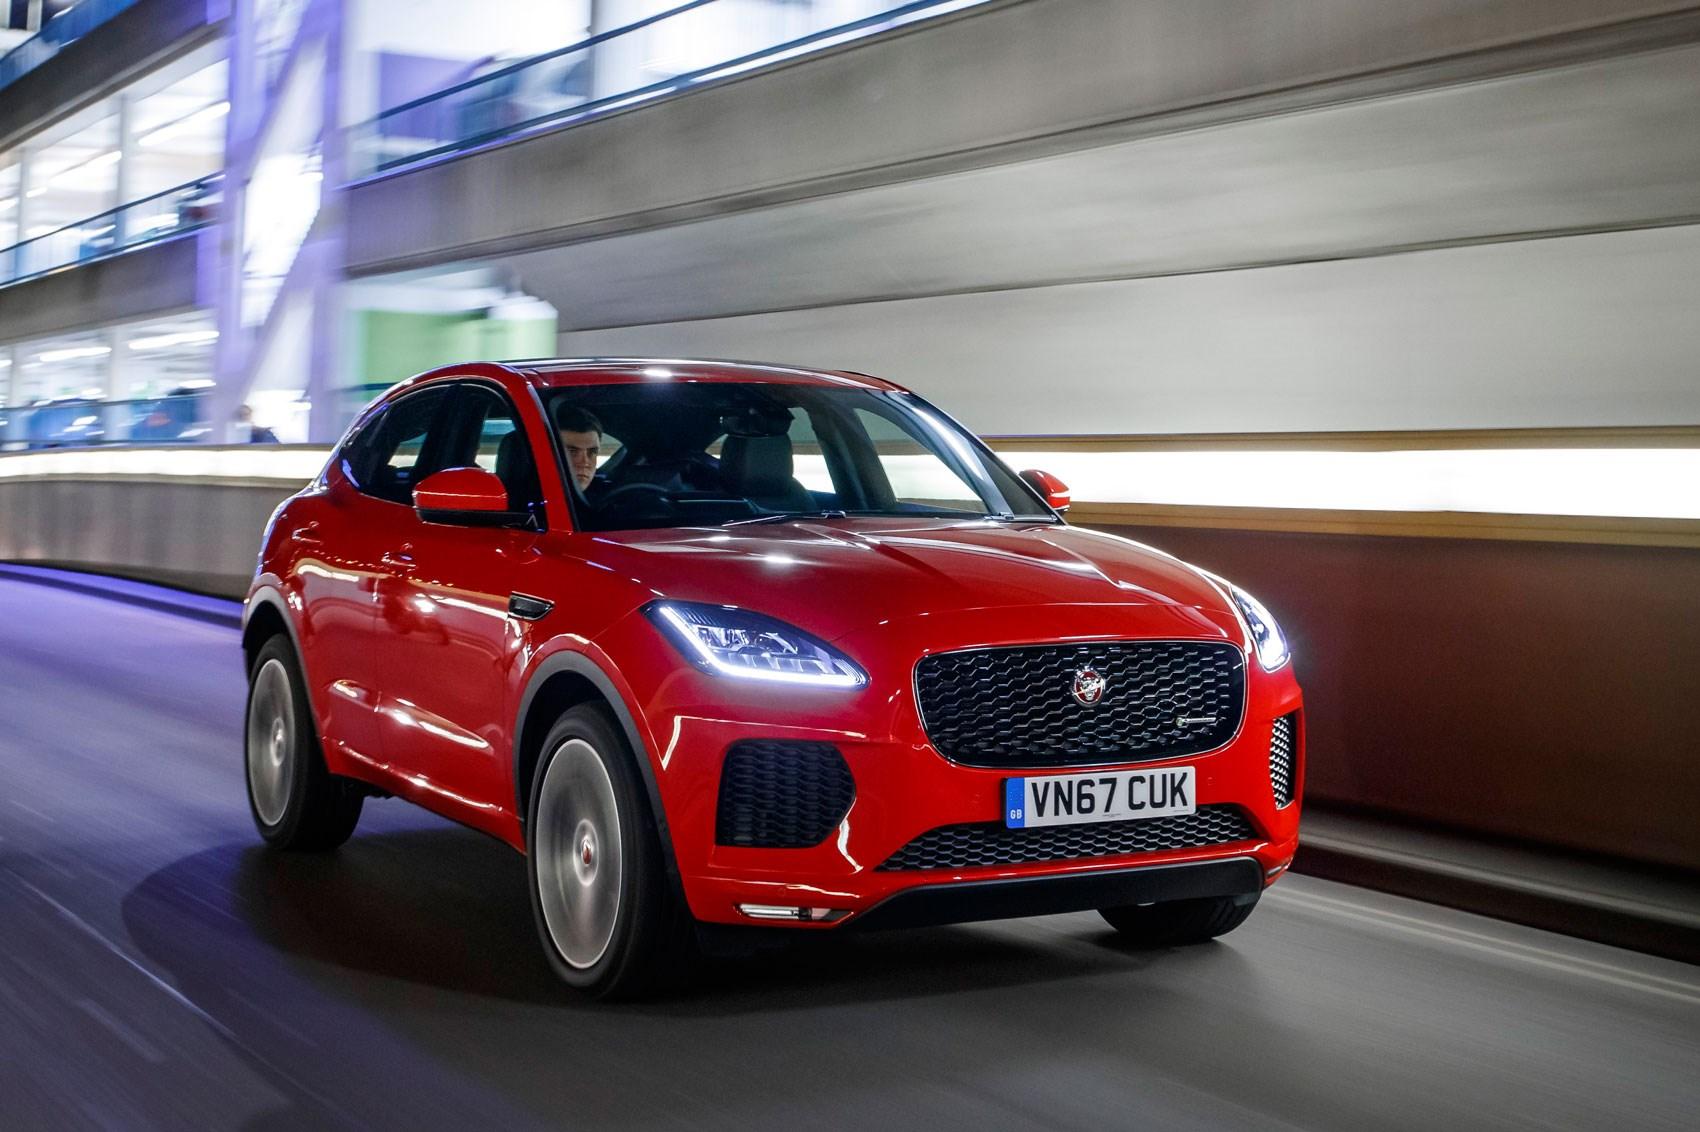 Sports Cars Evs And The V8 In Twilight Ian Callum On Jaguar S Future